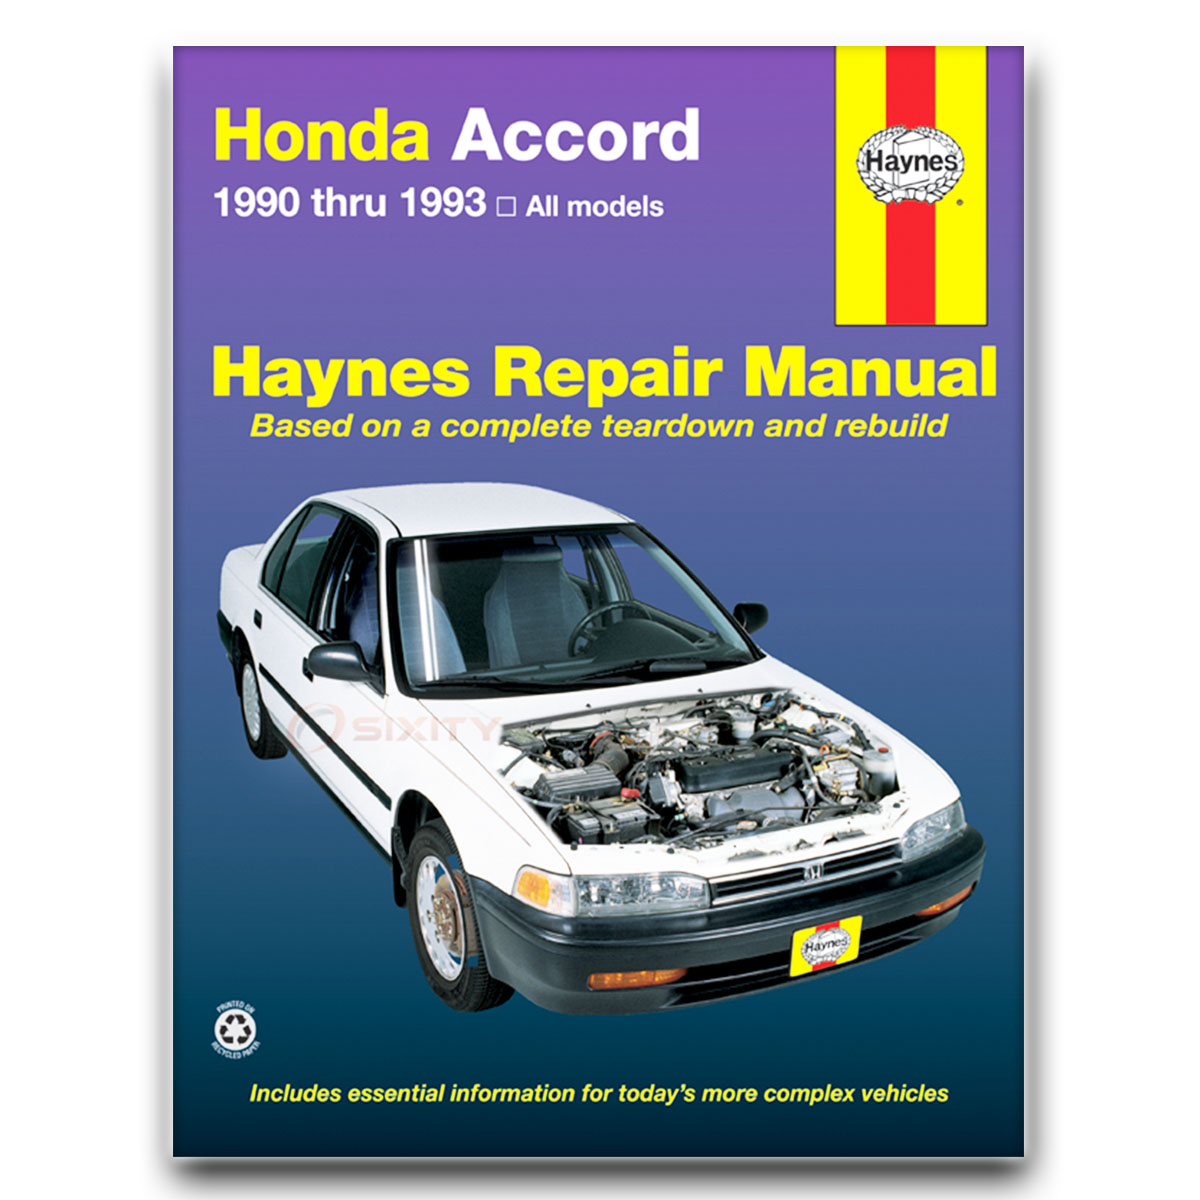 93 accord repair manual schematics wiring diagrams u2022 rh seniorlivinguniversity co 1995 jeep grand cherokee repair manual pdf 1995 jeep grand cherokee repair manual pdf